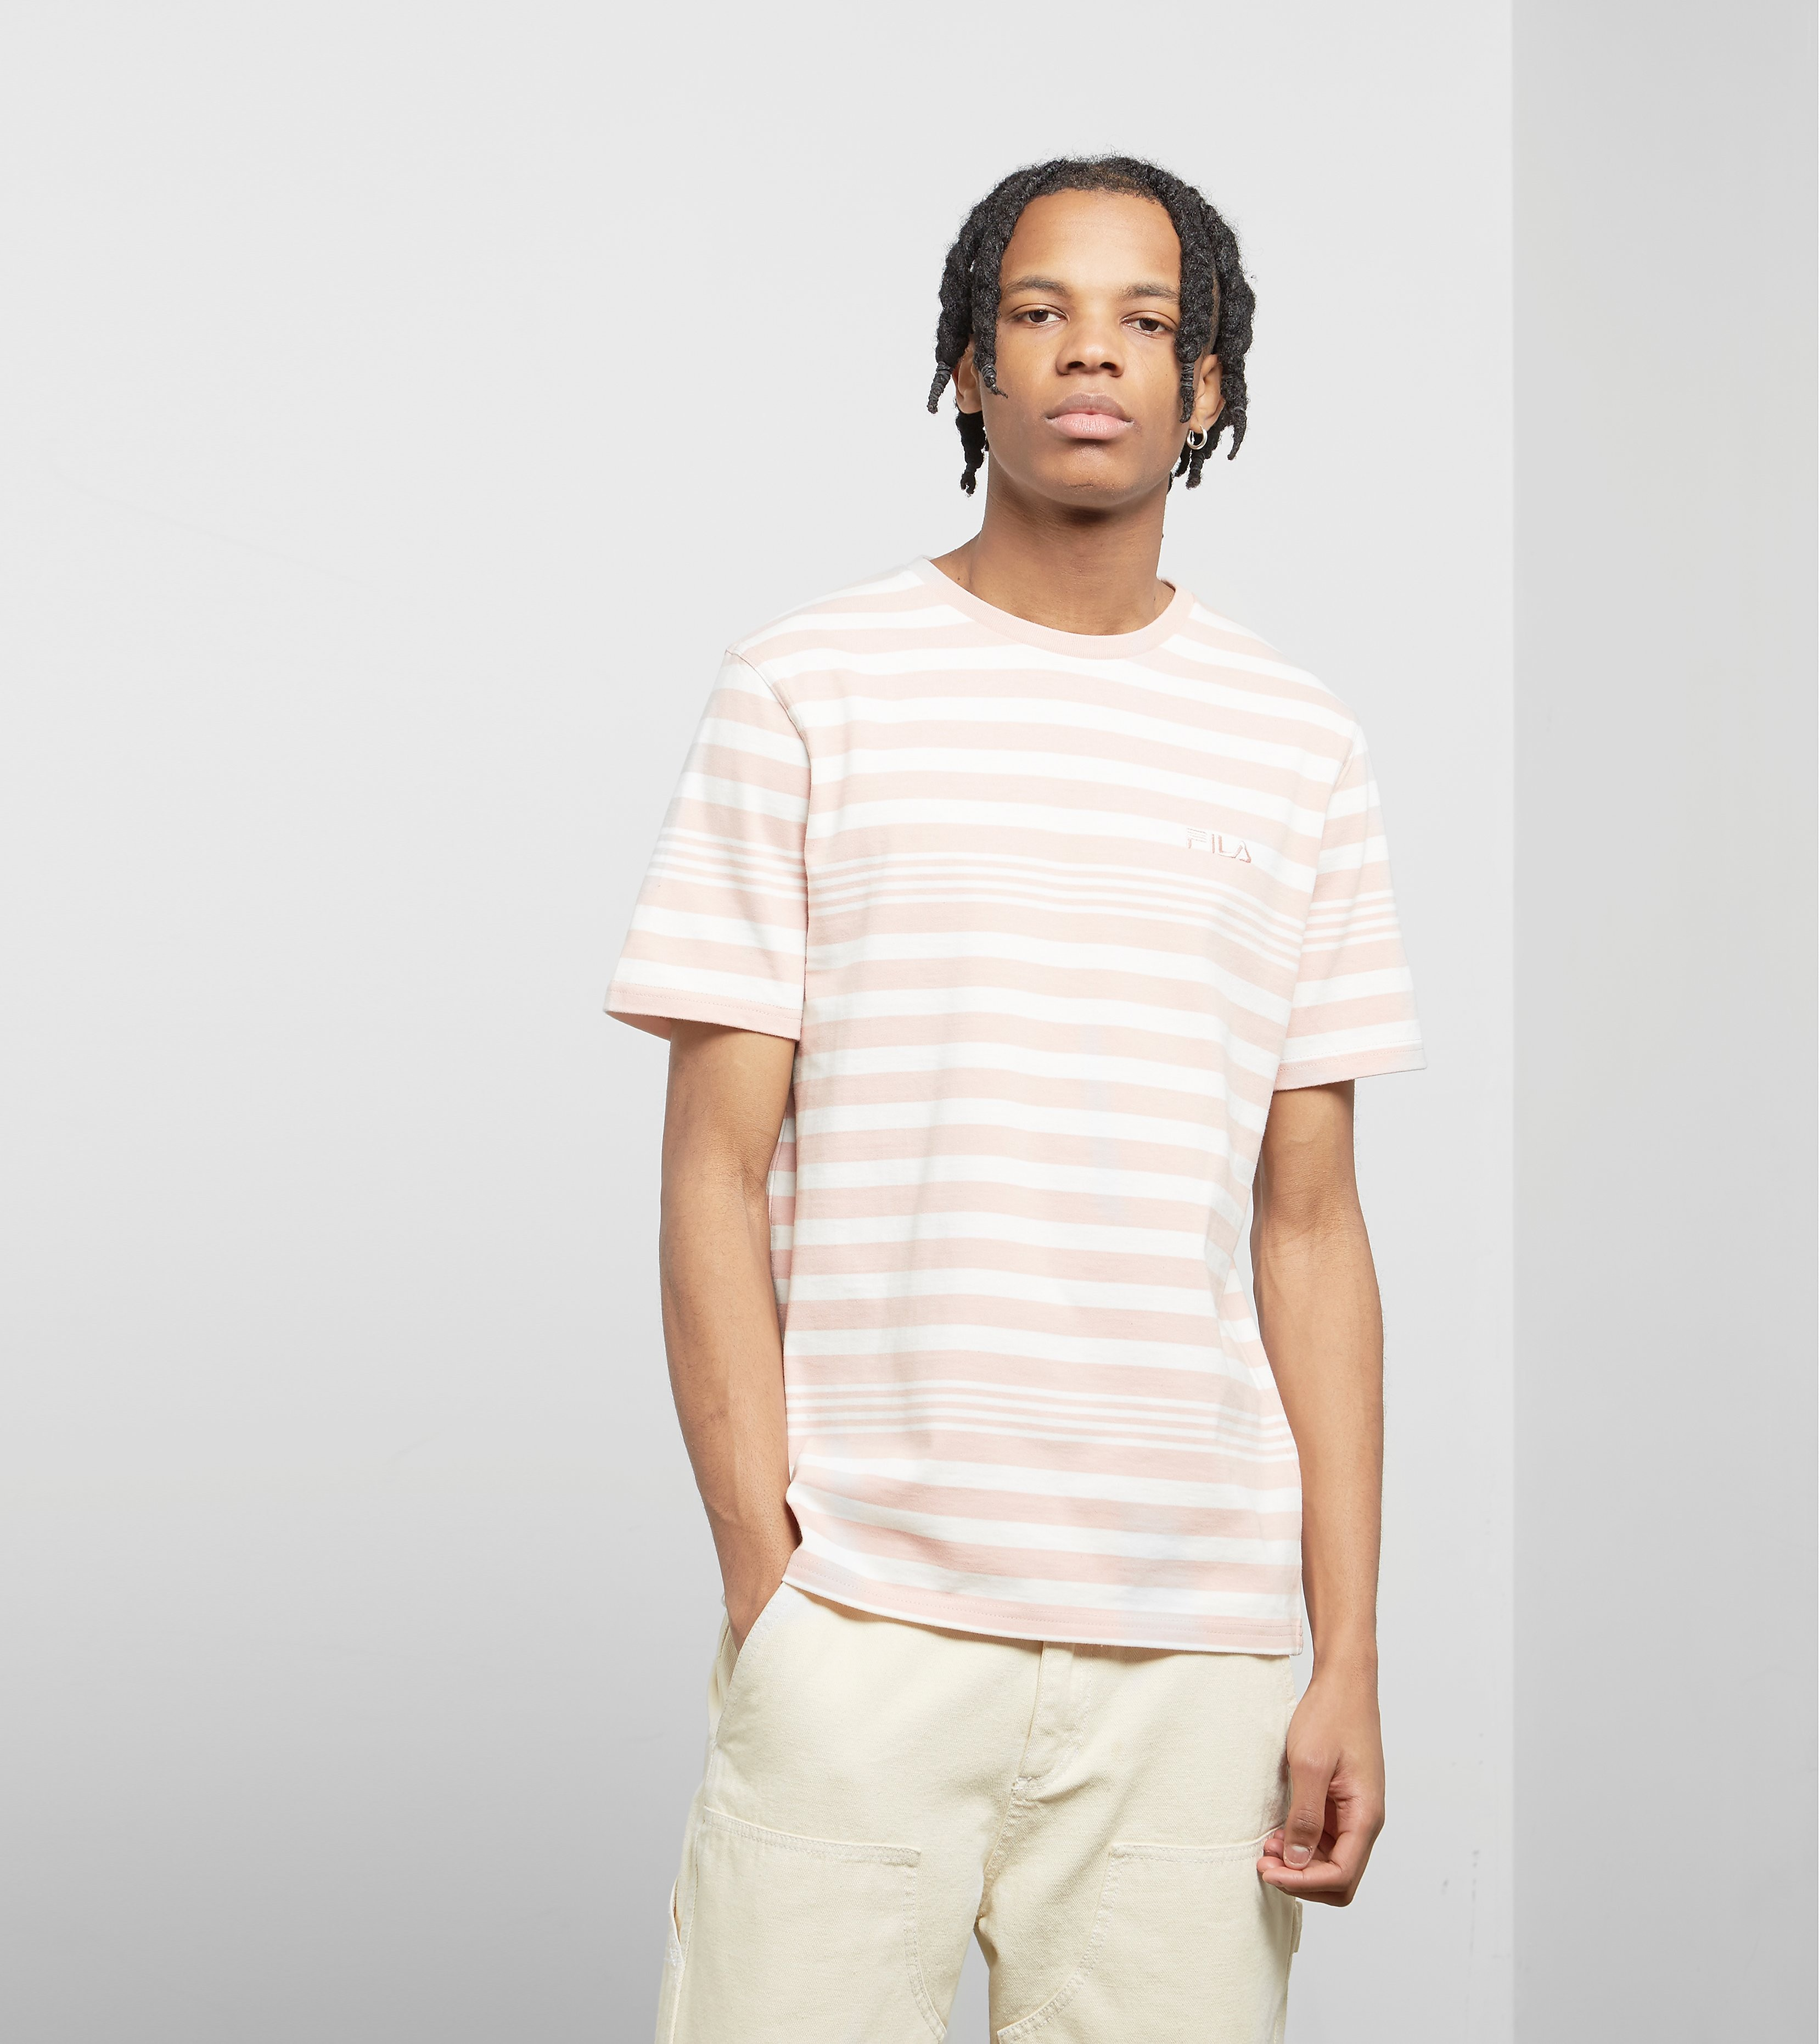 Fila Cometa T-Shirt - size? Exclusive